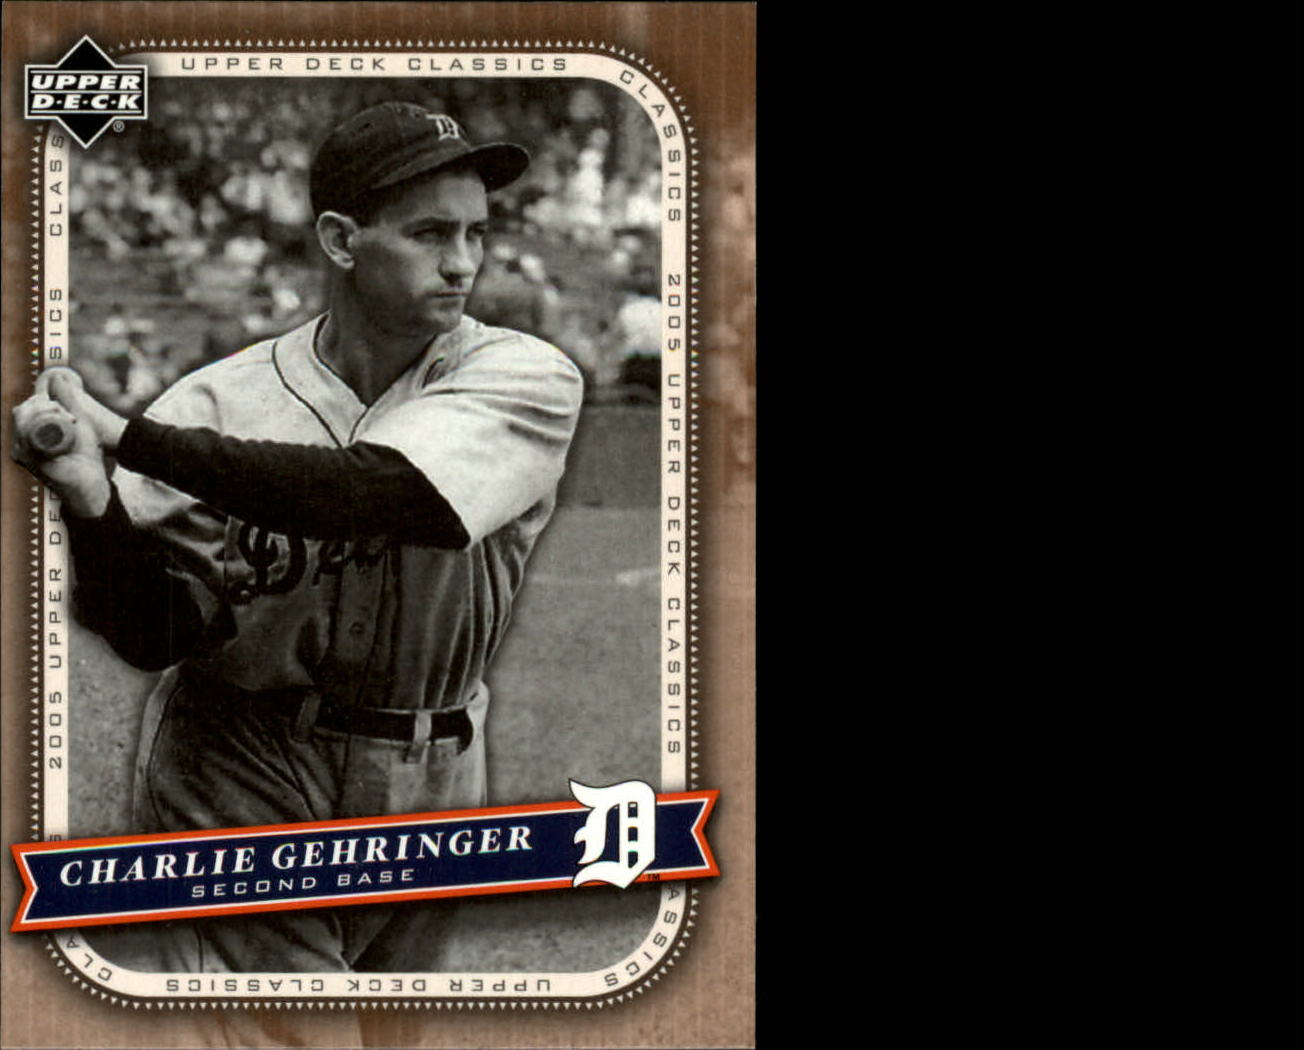 2005 Upper Deck Classics #21 Charlie Gehringer